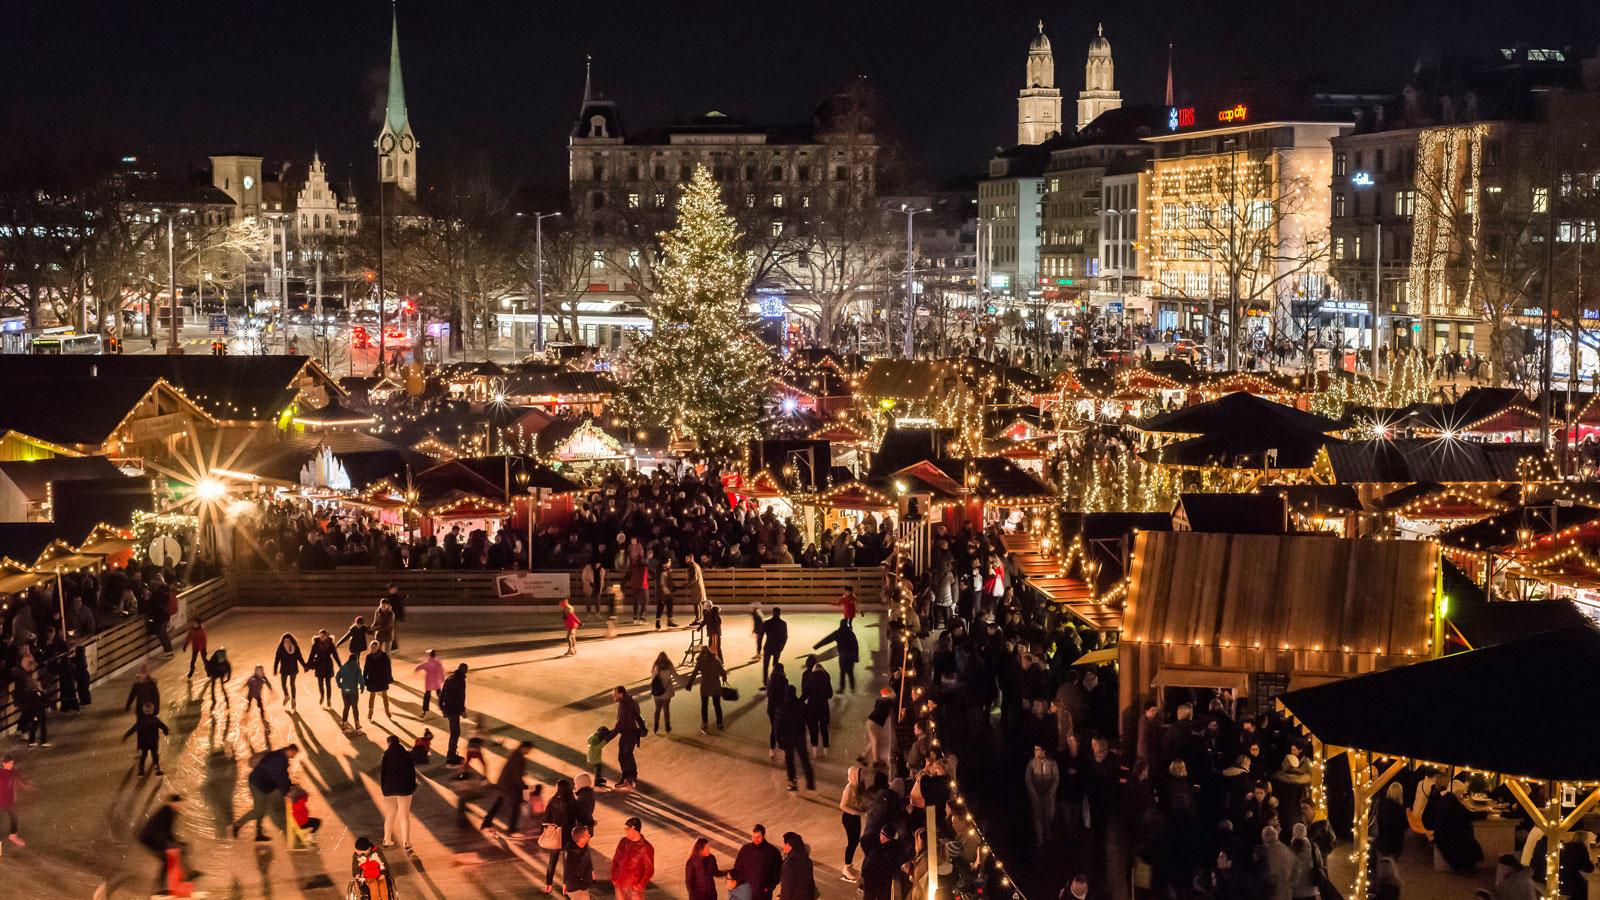 http://blog.via.com/wp-content/uploads/2016/12/web_zurich_christmas_iceskating_wienachtsdorf_1600x900.jpg